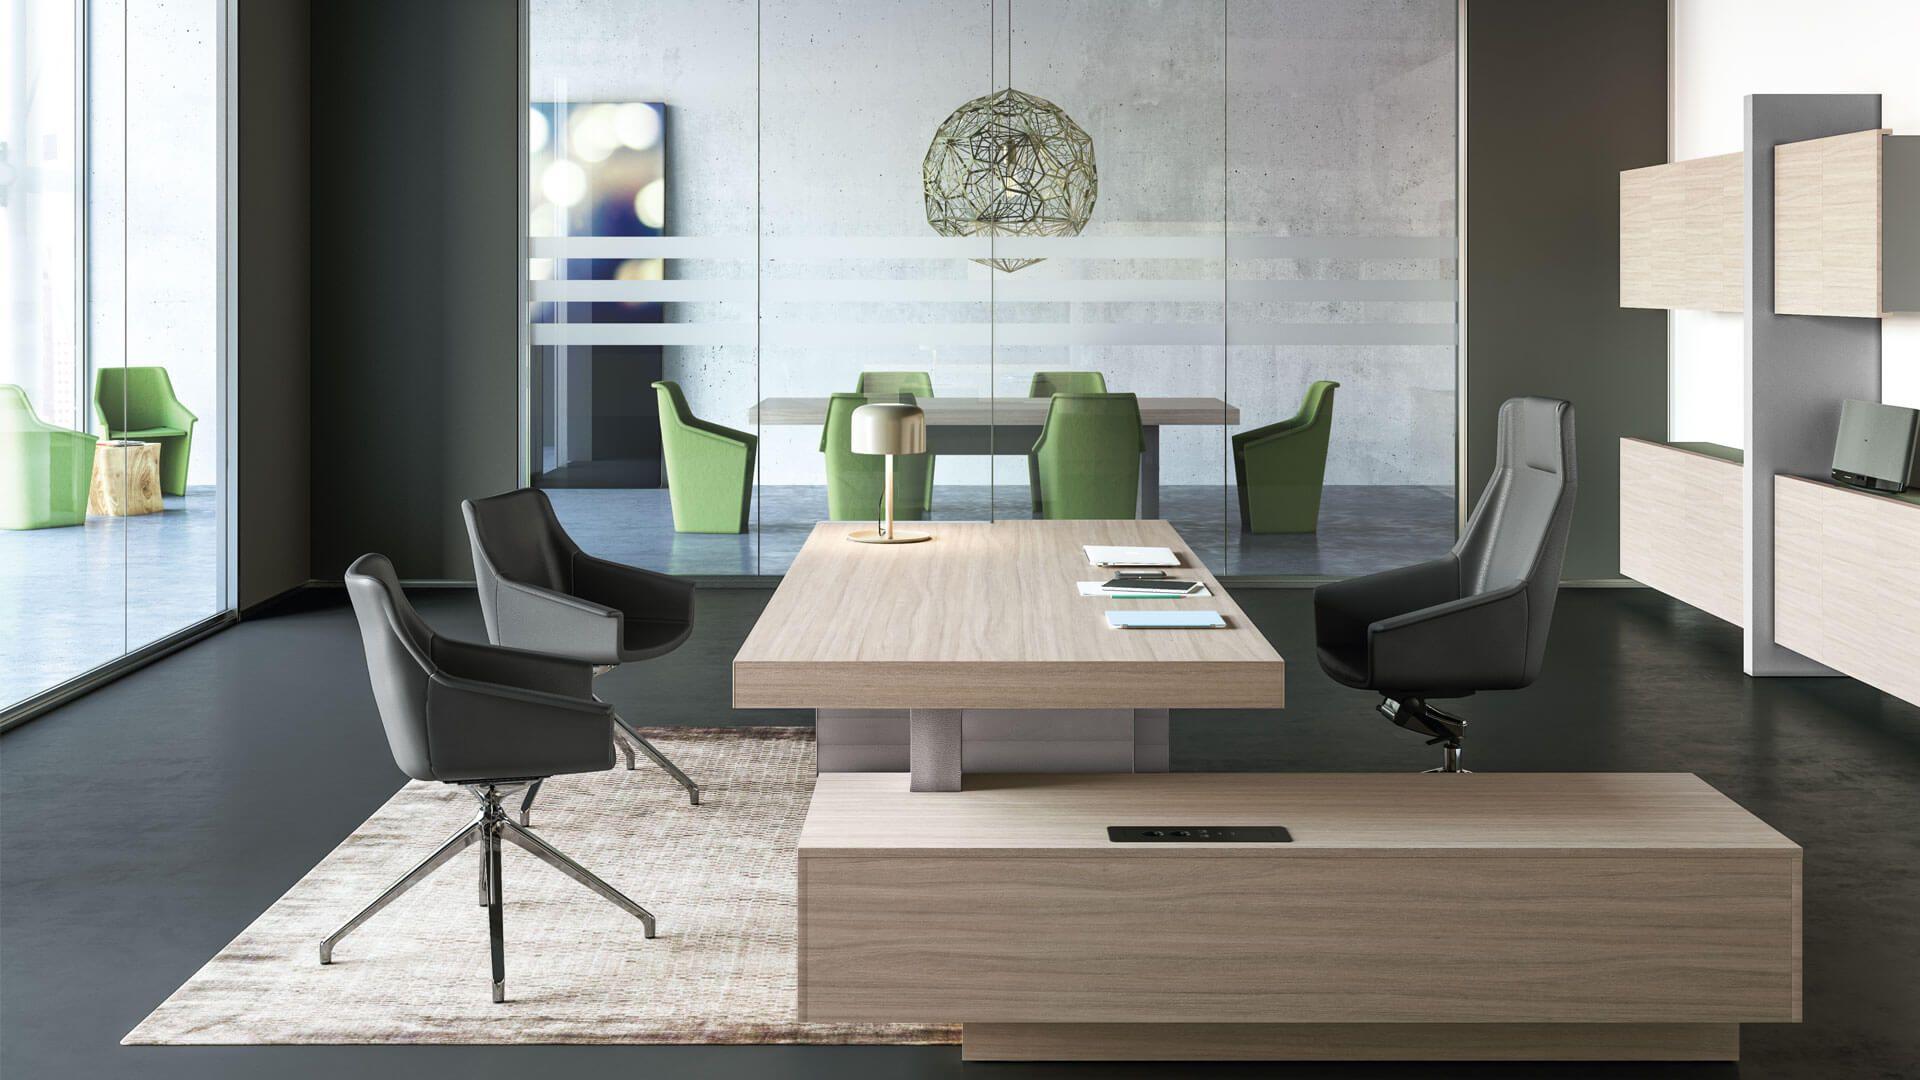 10 Ideas De Escritorios Ejecutivos Escritorio Ejecutivo Diseño De Interiores Escritorios